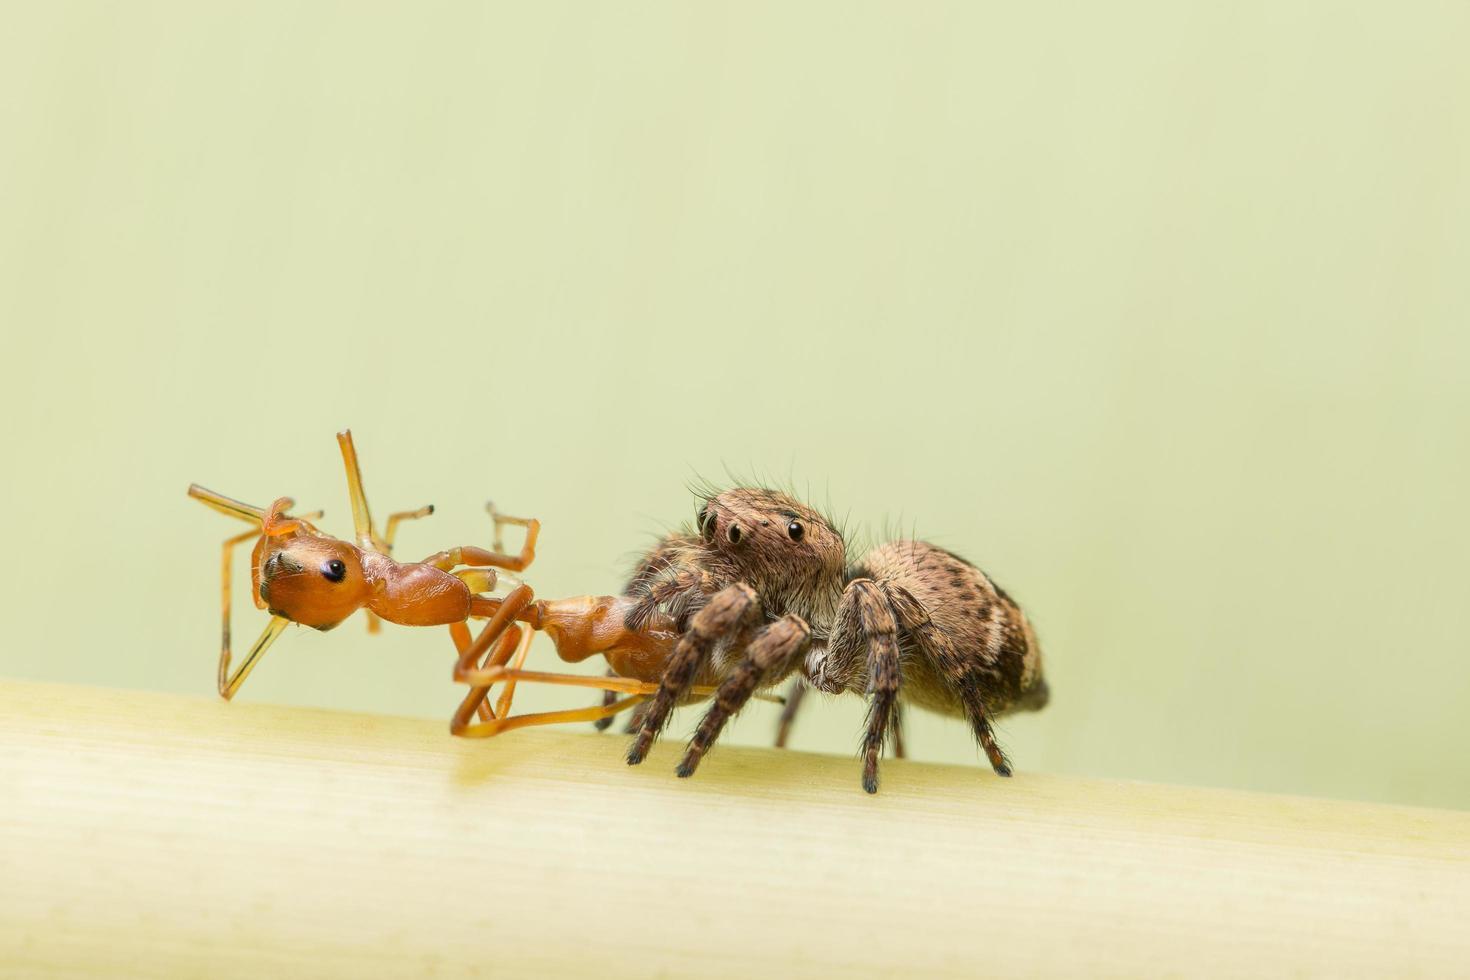 araignée mange fourmi photo